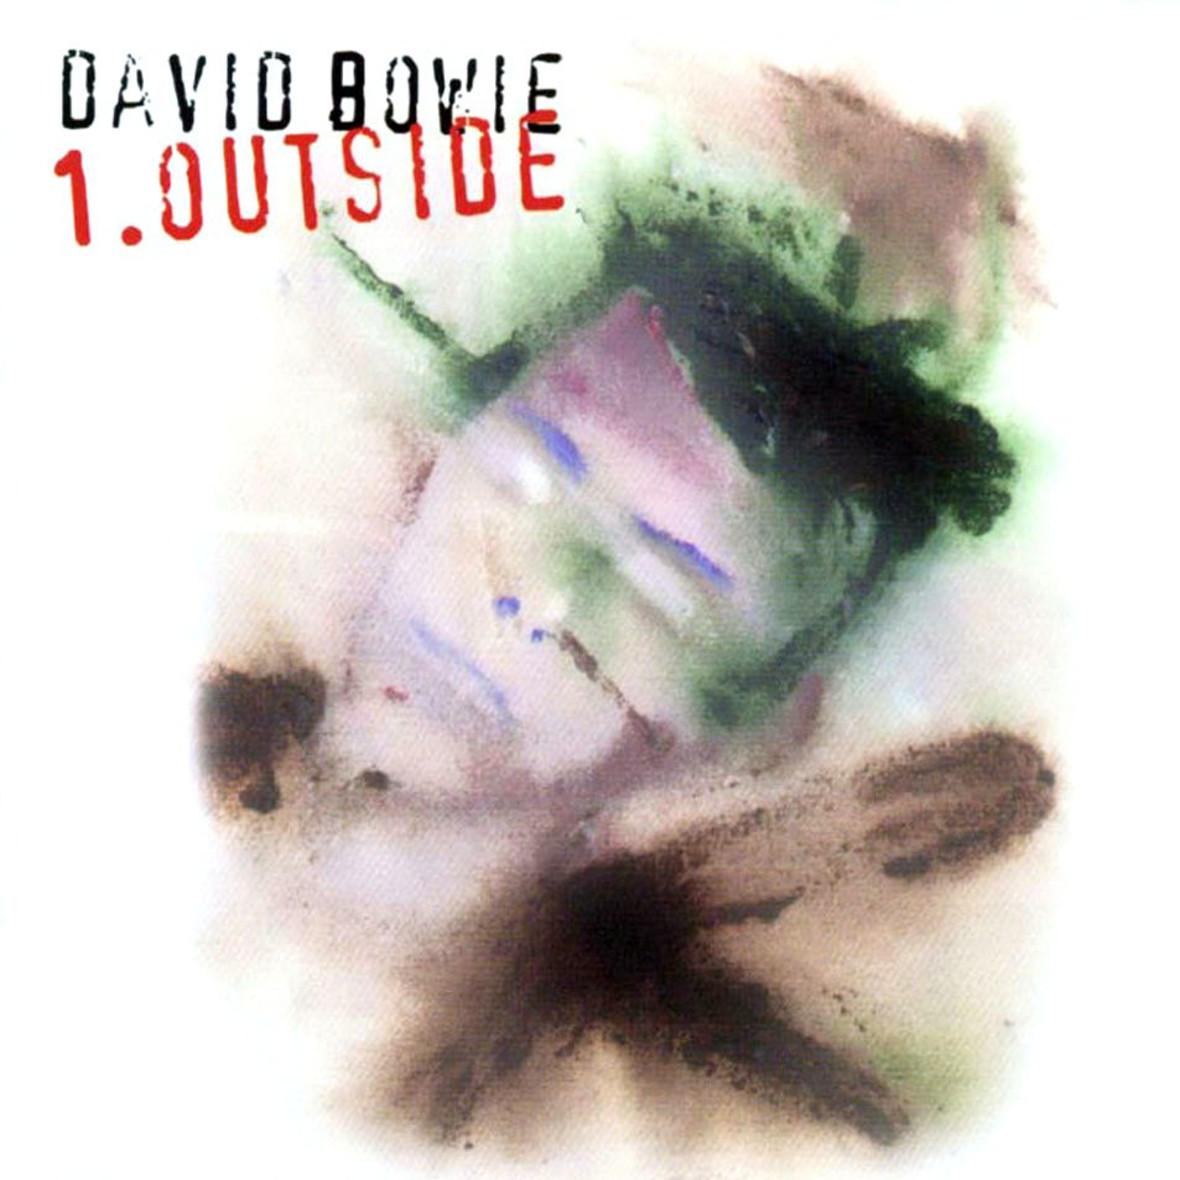 BOWIE DAVID – 1. Outside